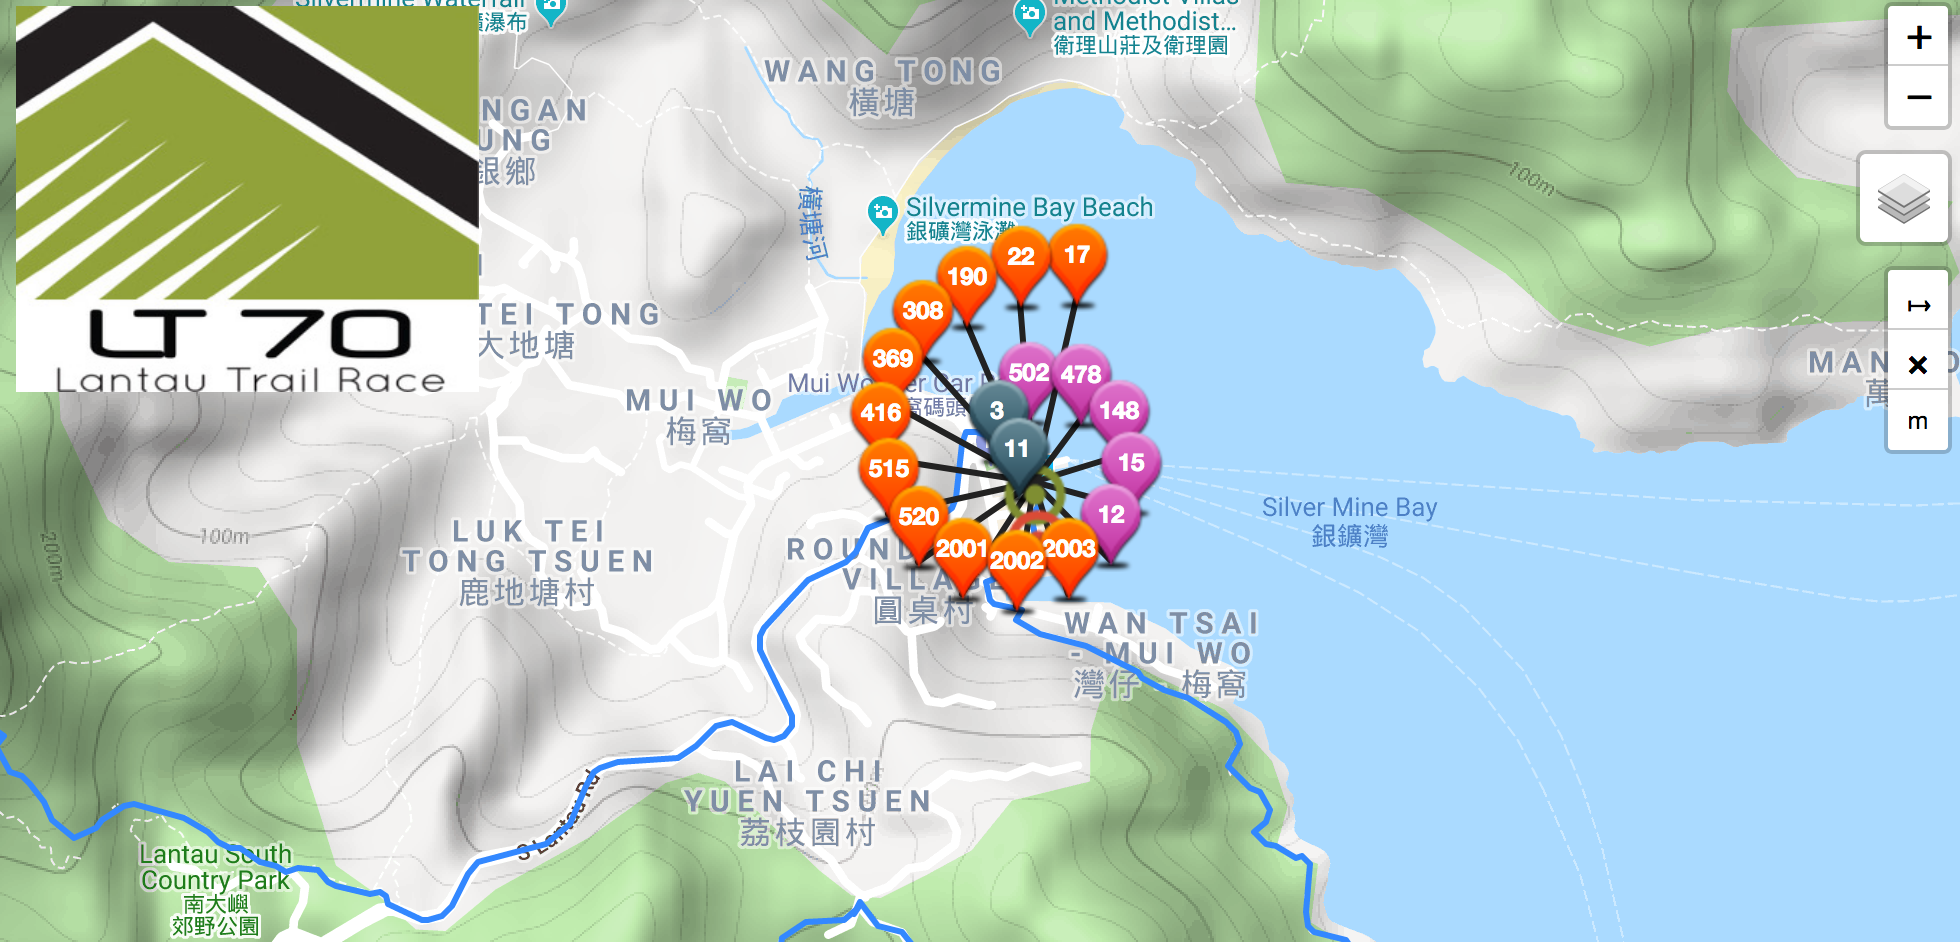 lantau-70-2018-live-tracking